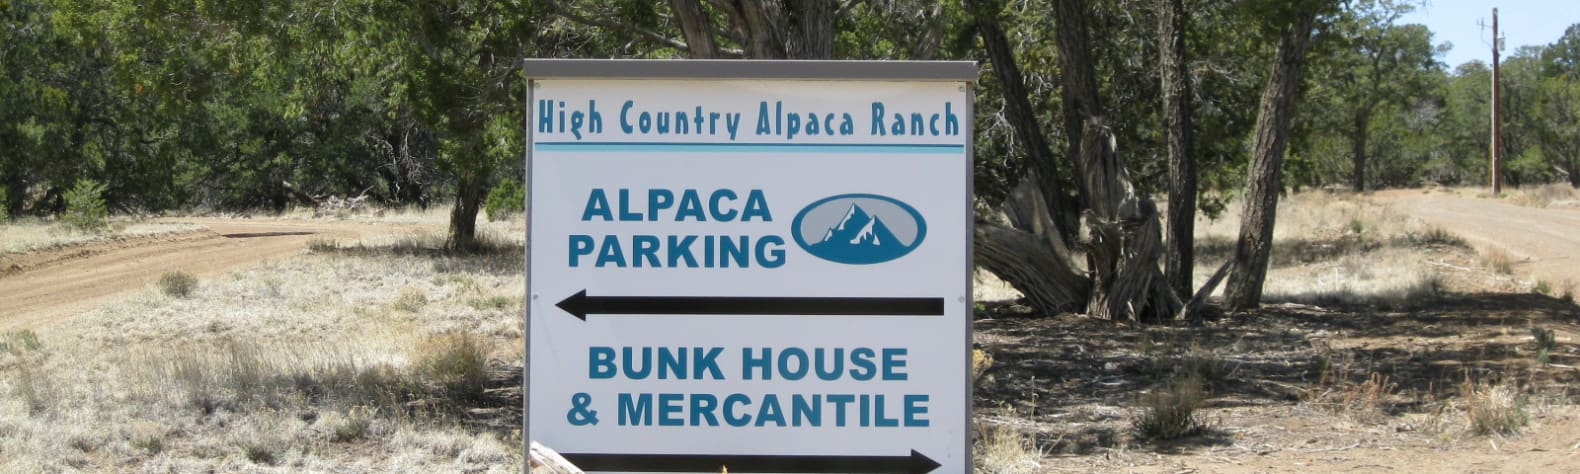 High Country Alpaca Ranch